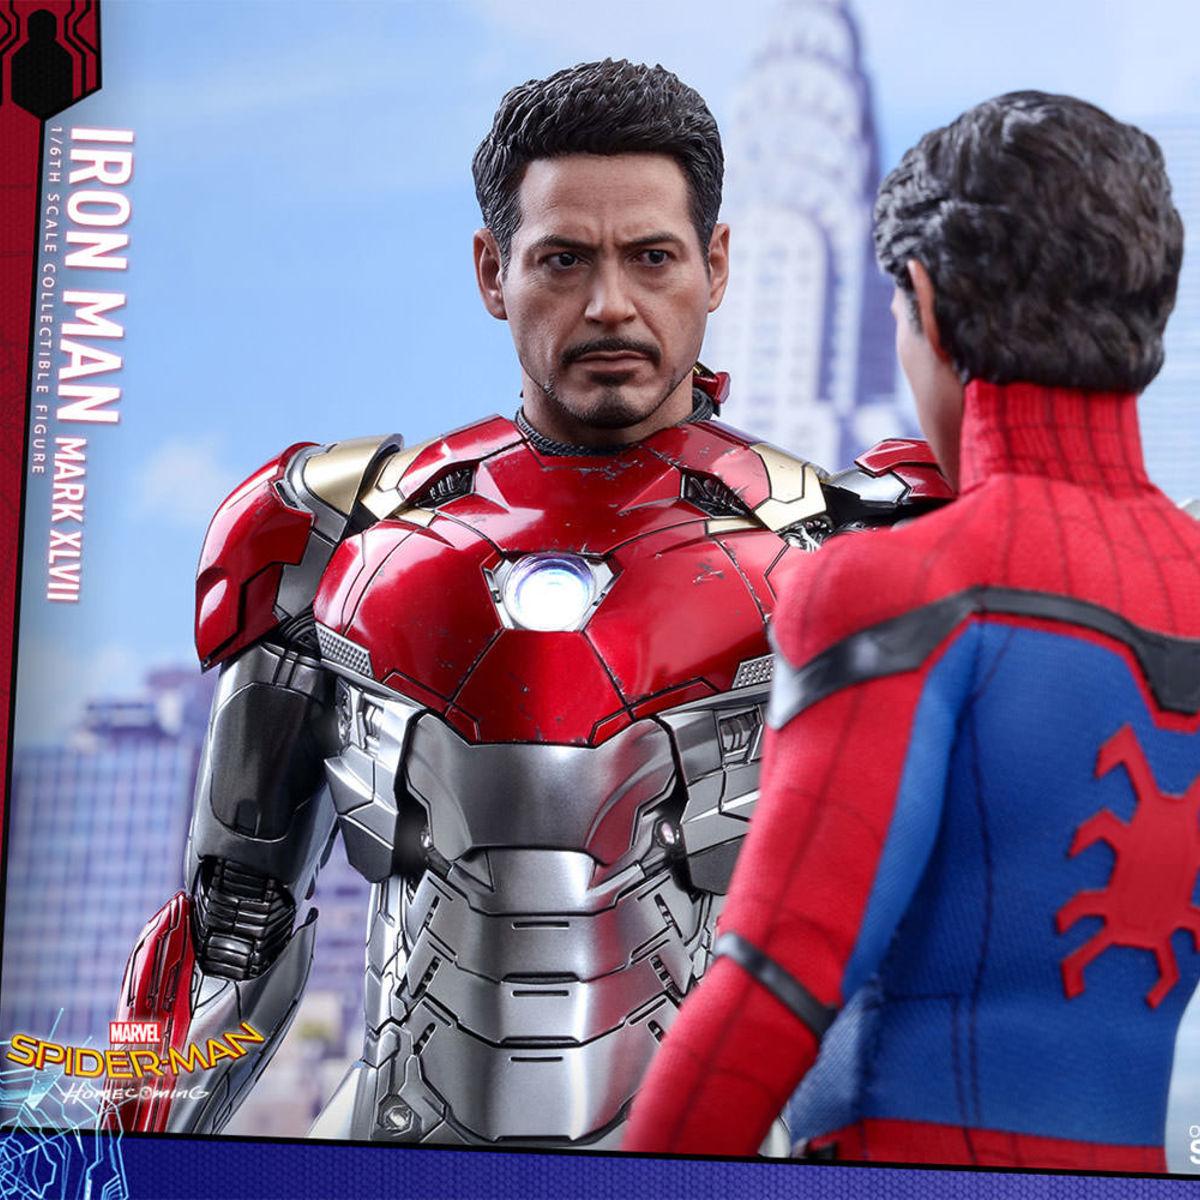 marvel-spider-man-homecoming-iron-man-mark-xlvii-sixth-scale-hot-toys-903079-16.jpg